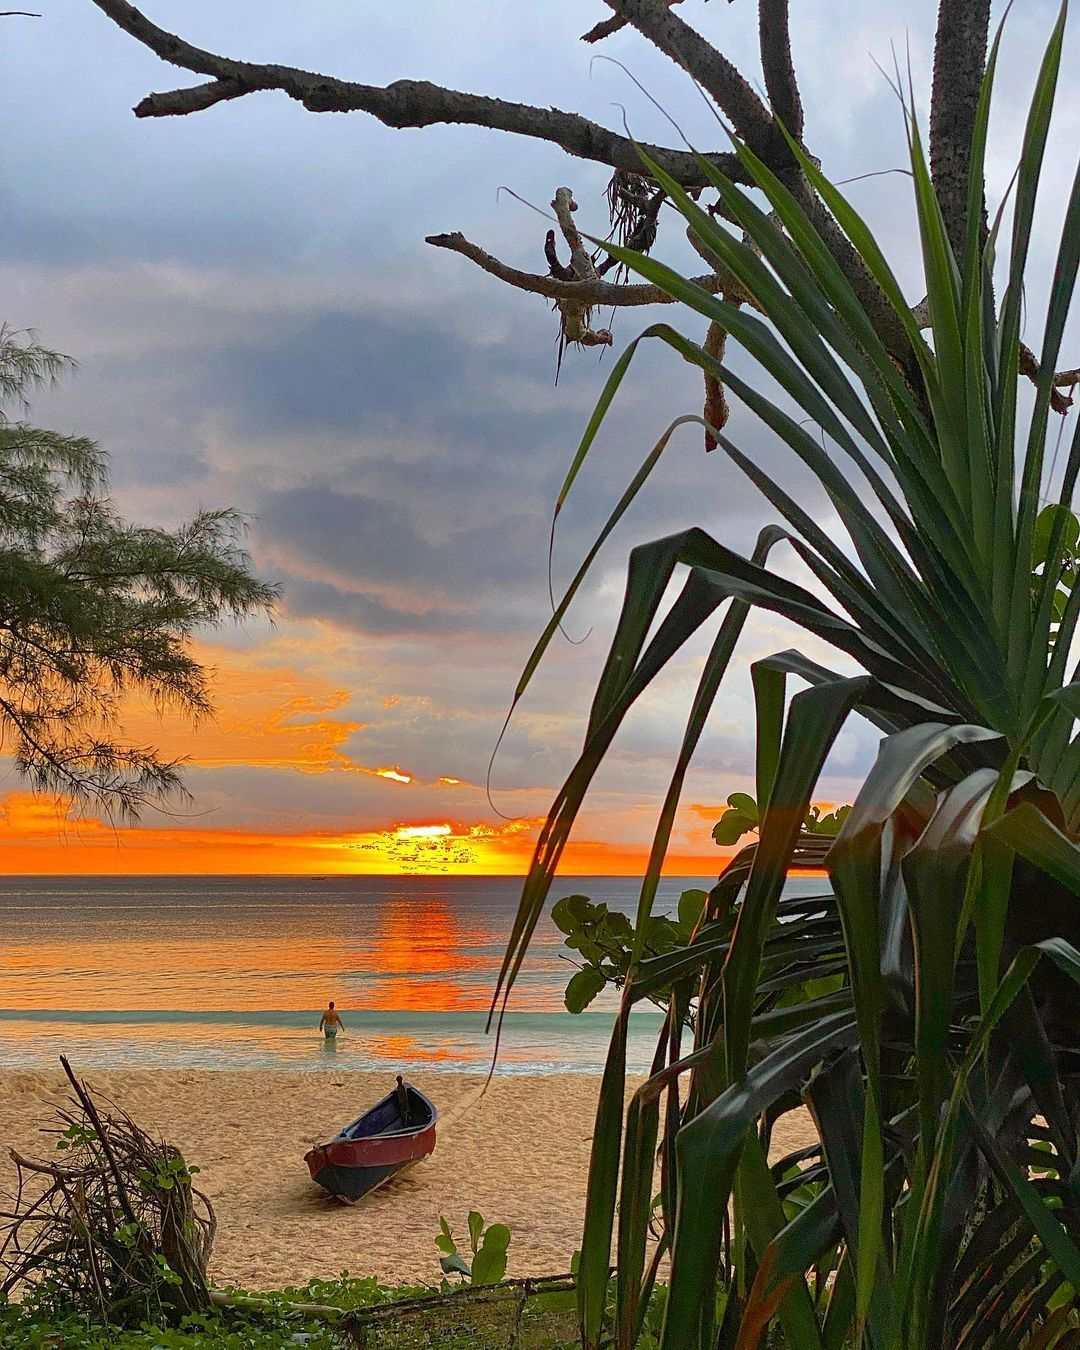 Zon gaat onder boven Nai Thon Beach op Phuket